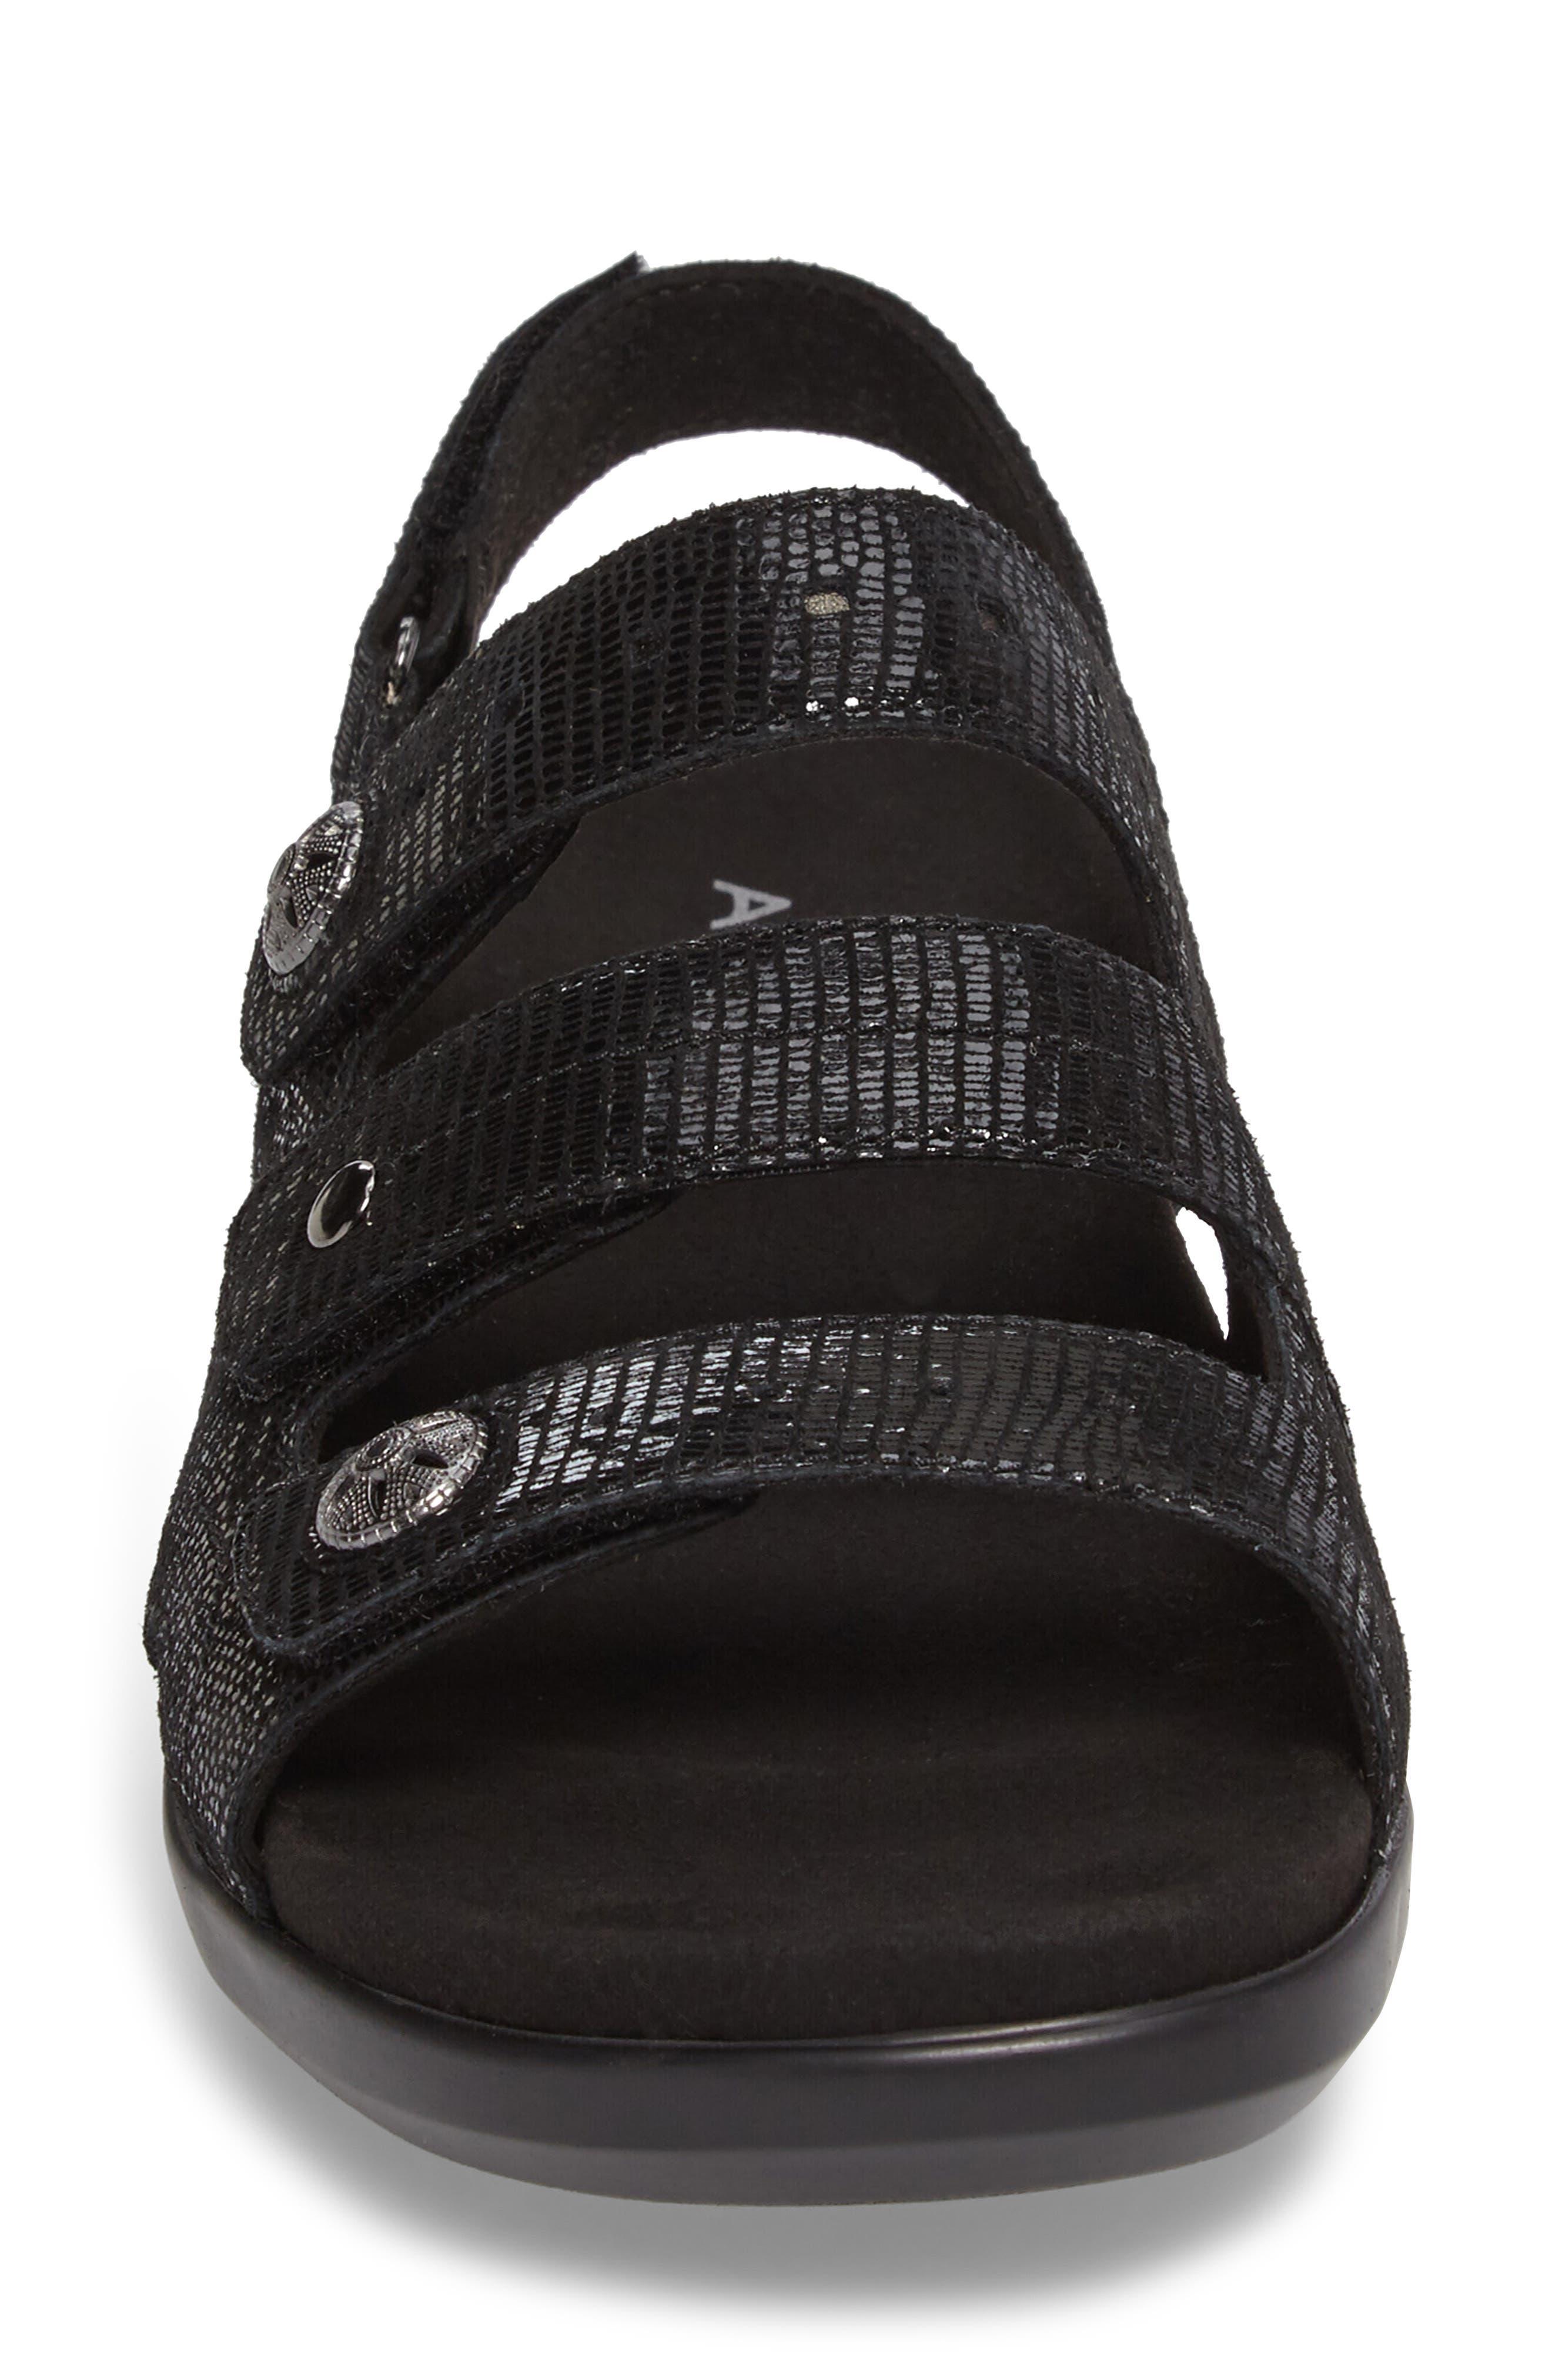 PC Wedge Sandal,                             Alternate thumbnail 4, color,                             BLACK FABRIC